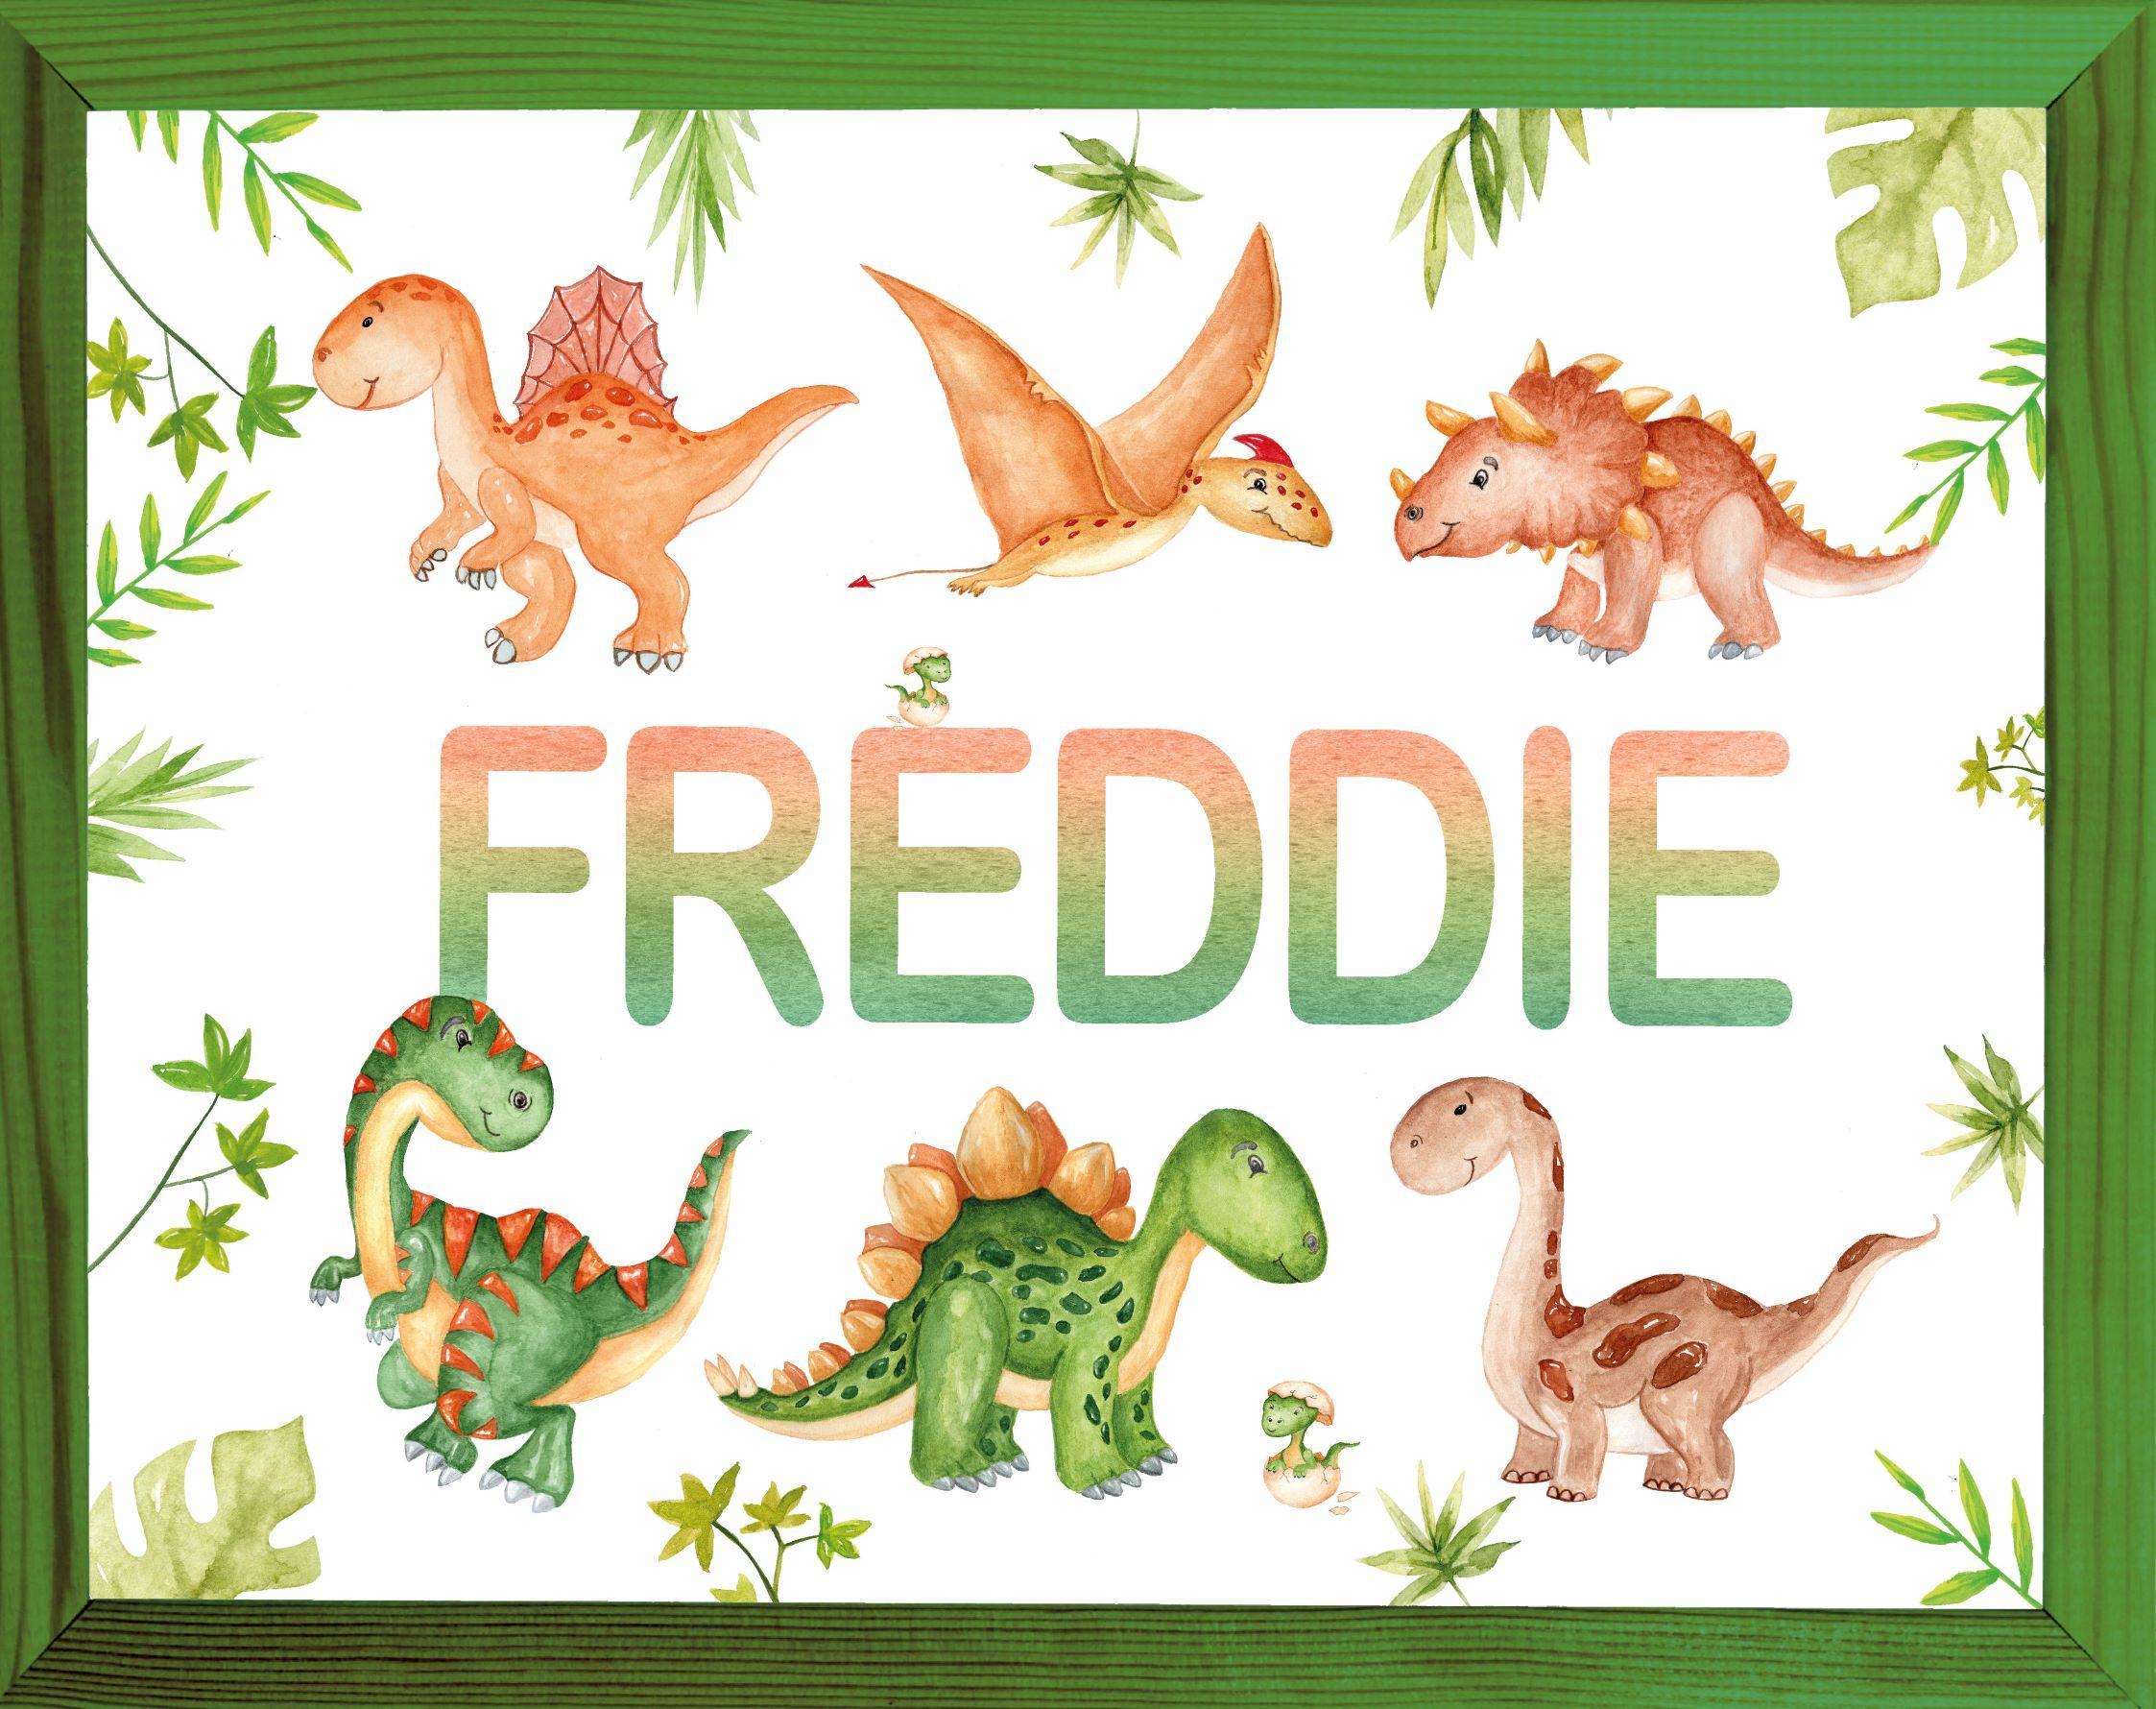 dinosaurs-personalised-print-great-dinosaur-gift-dinosaur-bedroom-or-playroom